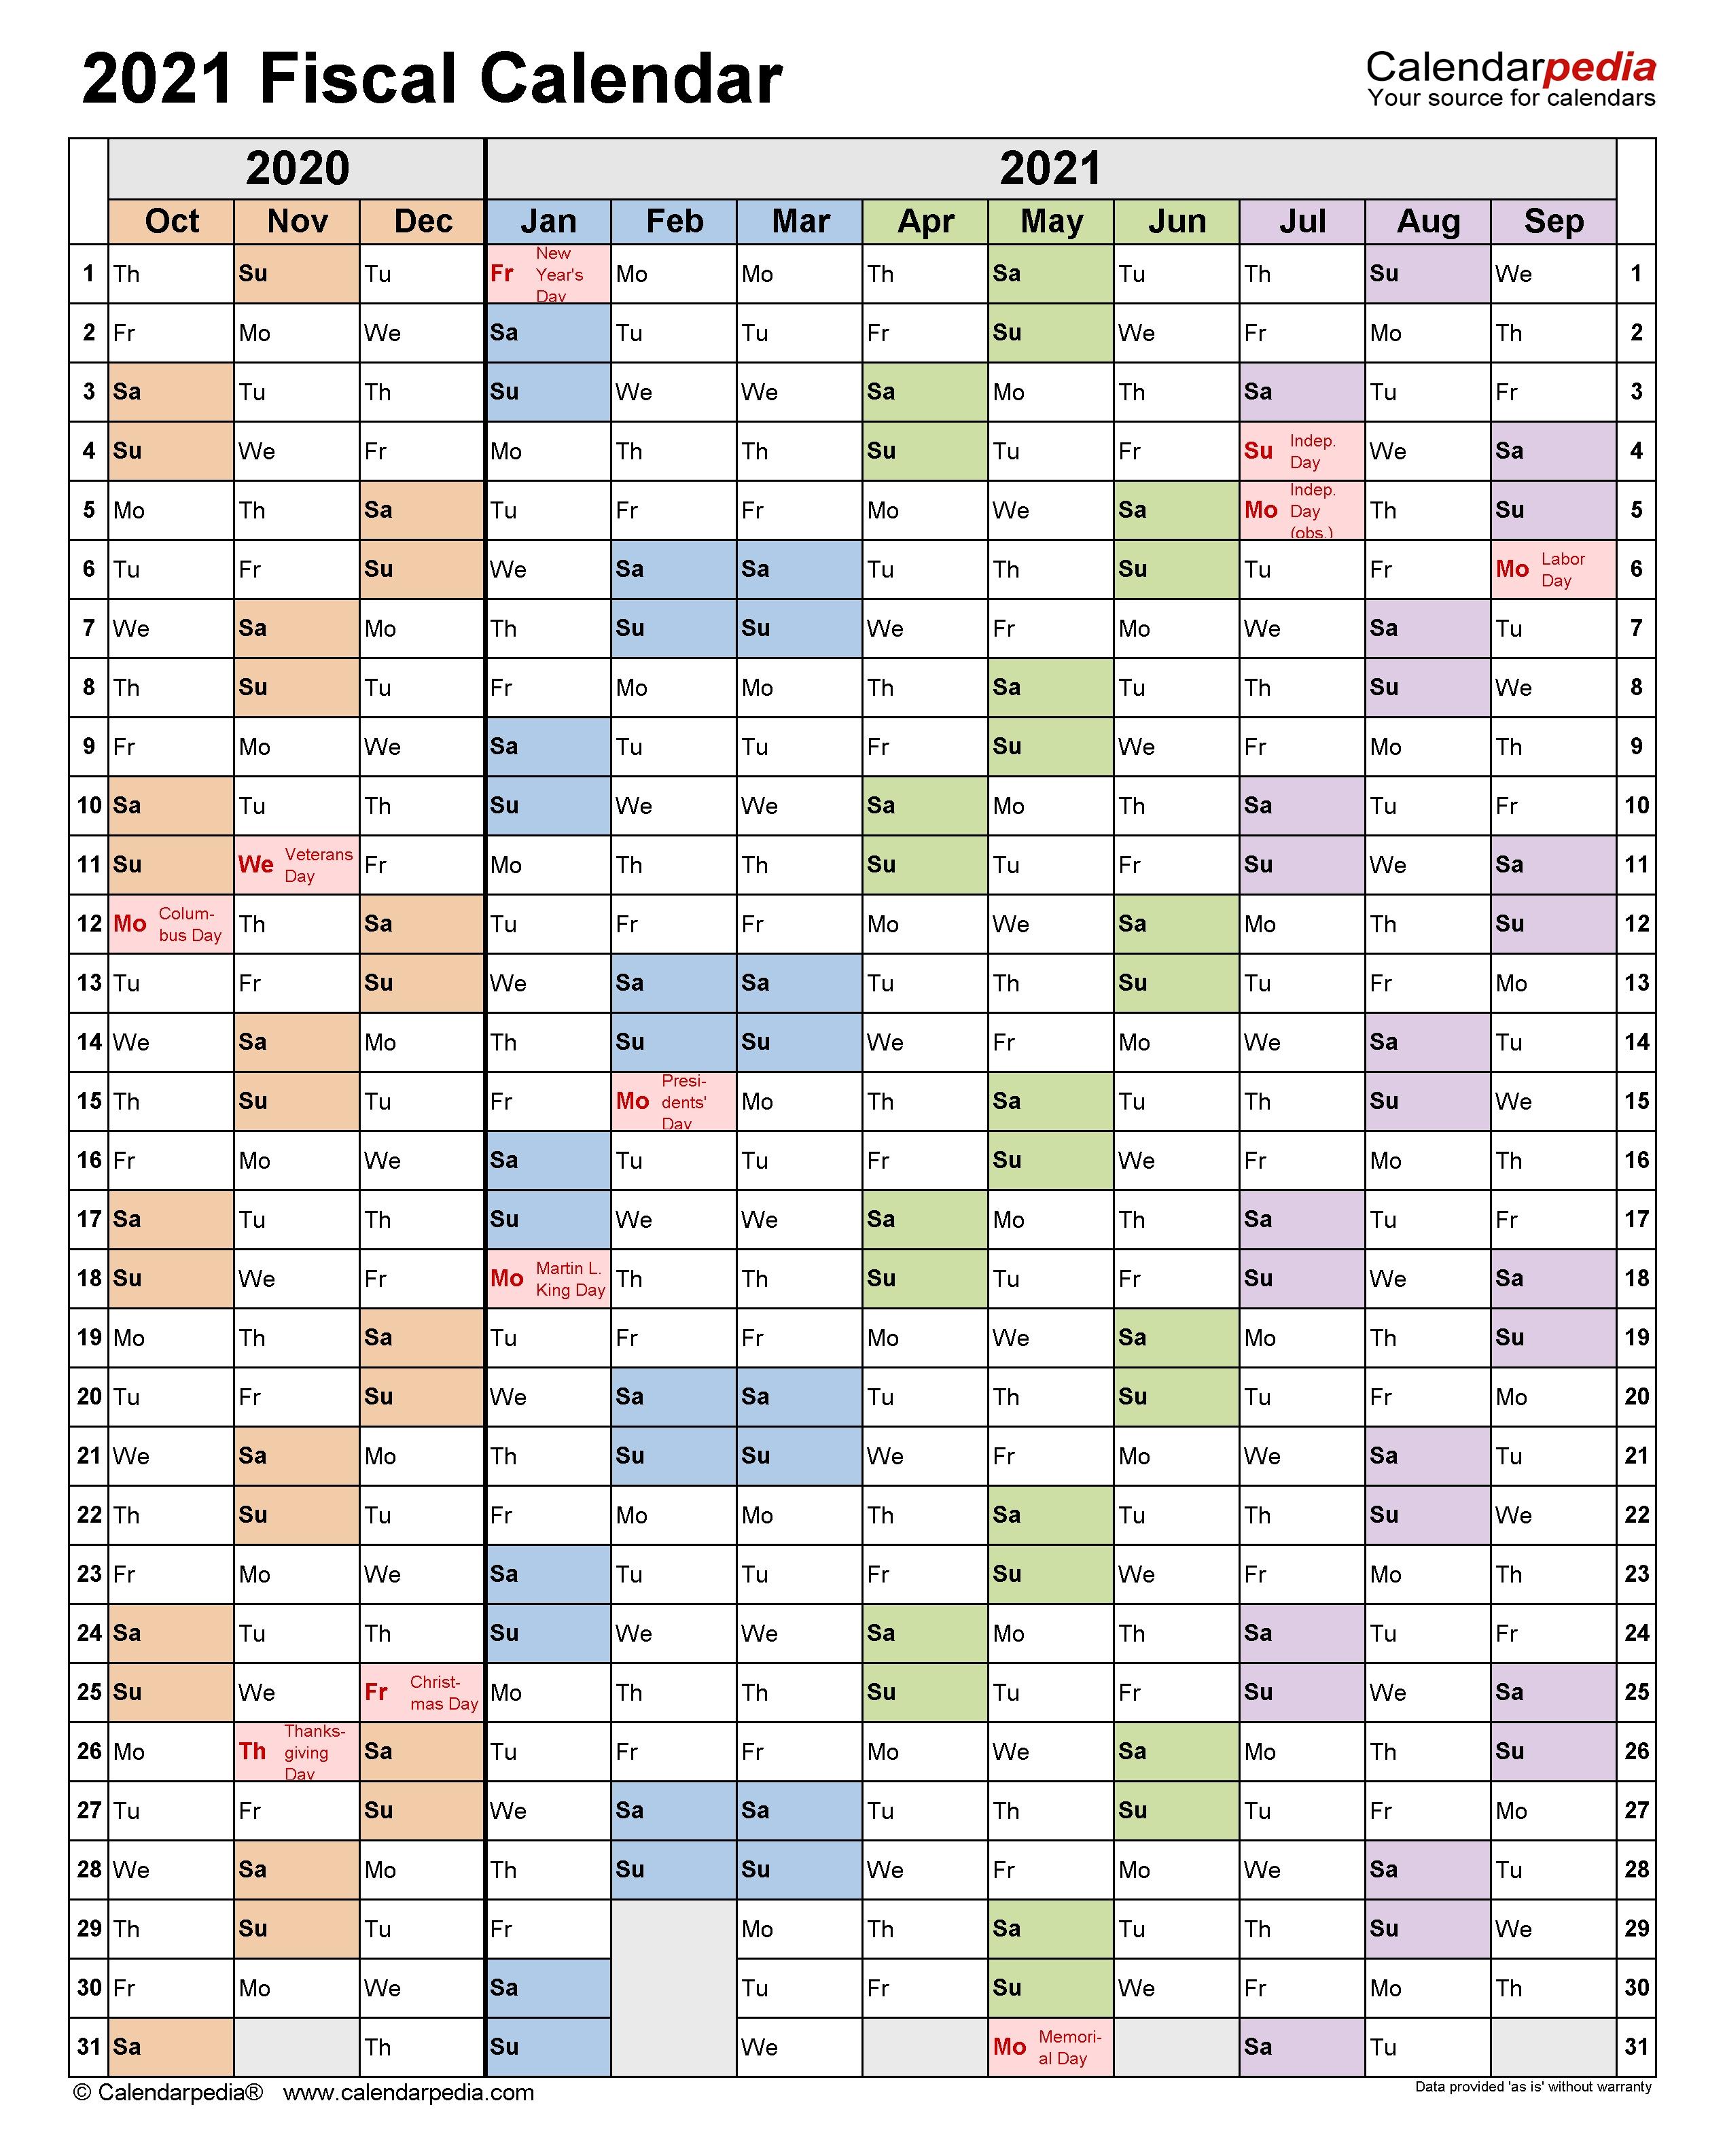 Fiscal Calendars 2021 - Free Printable Pdf Templates  Financial Year Calendar 2021/2021 In Australia